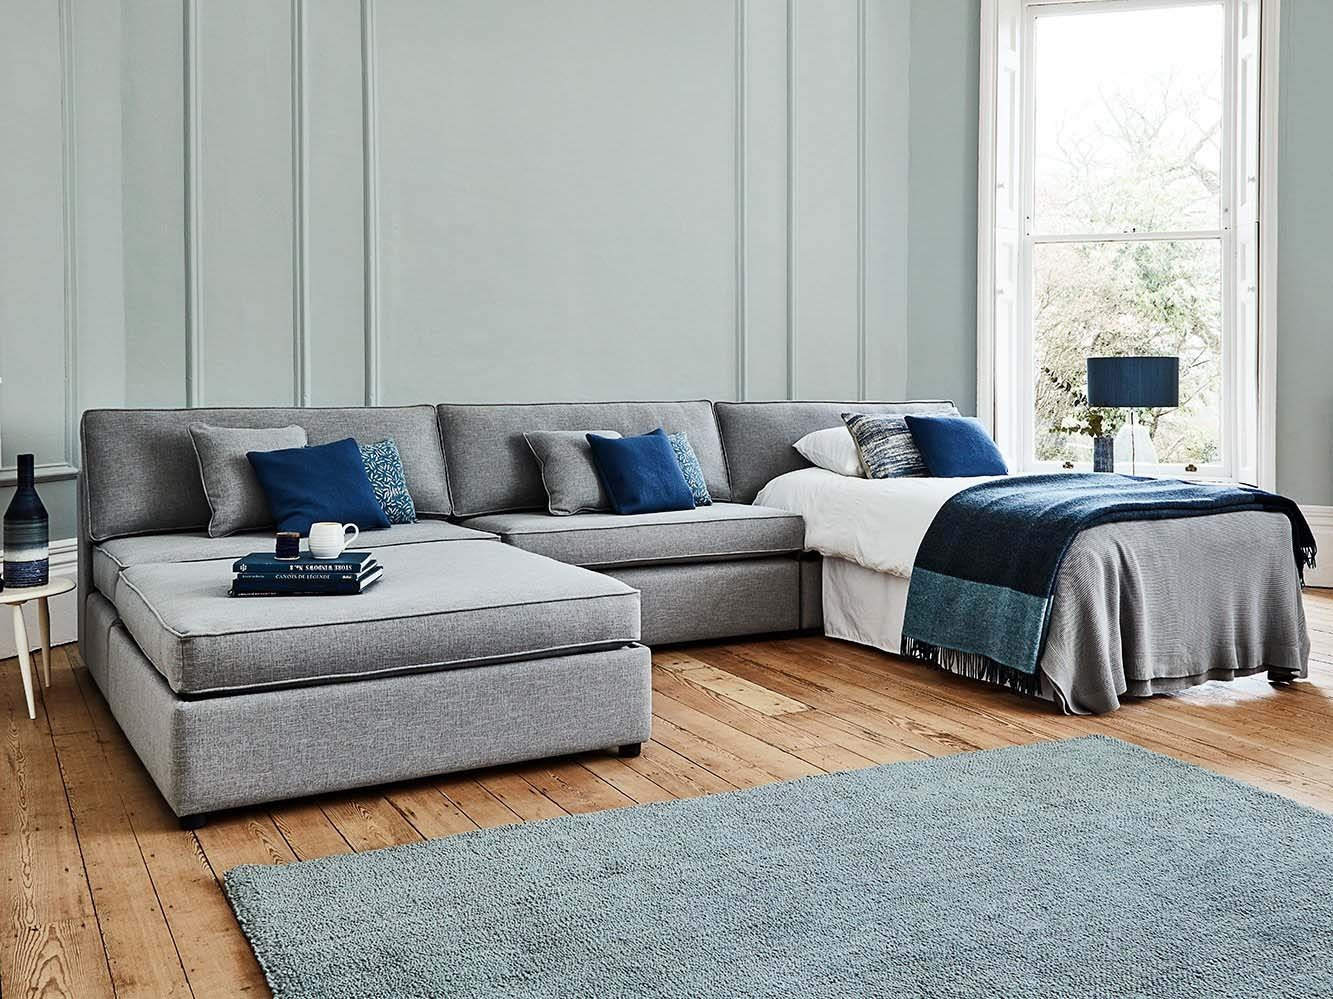 Luxury modular sofa beds with ottoman